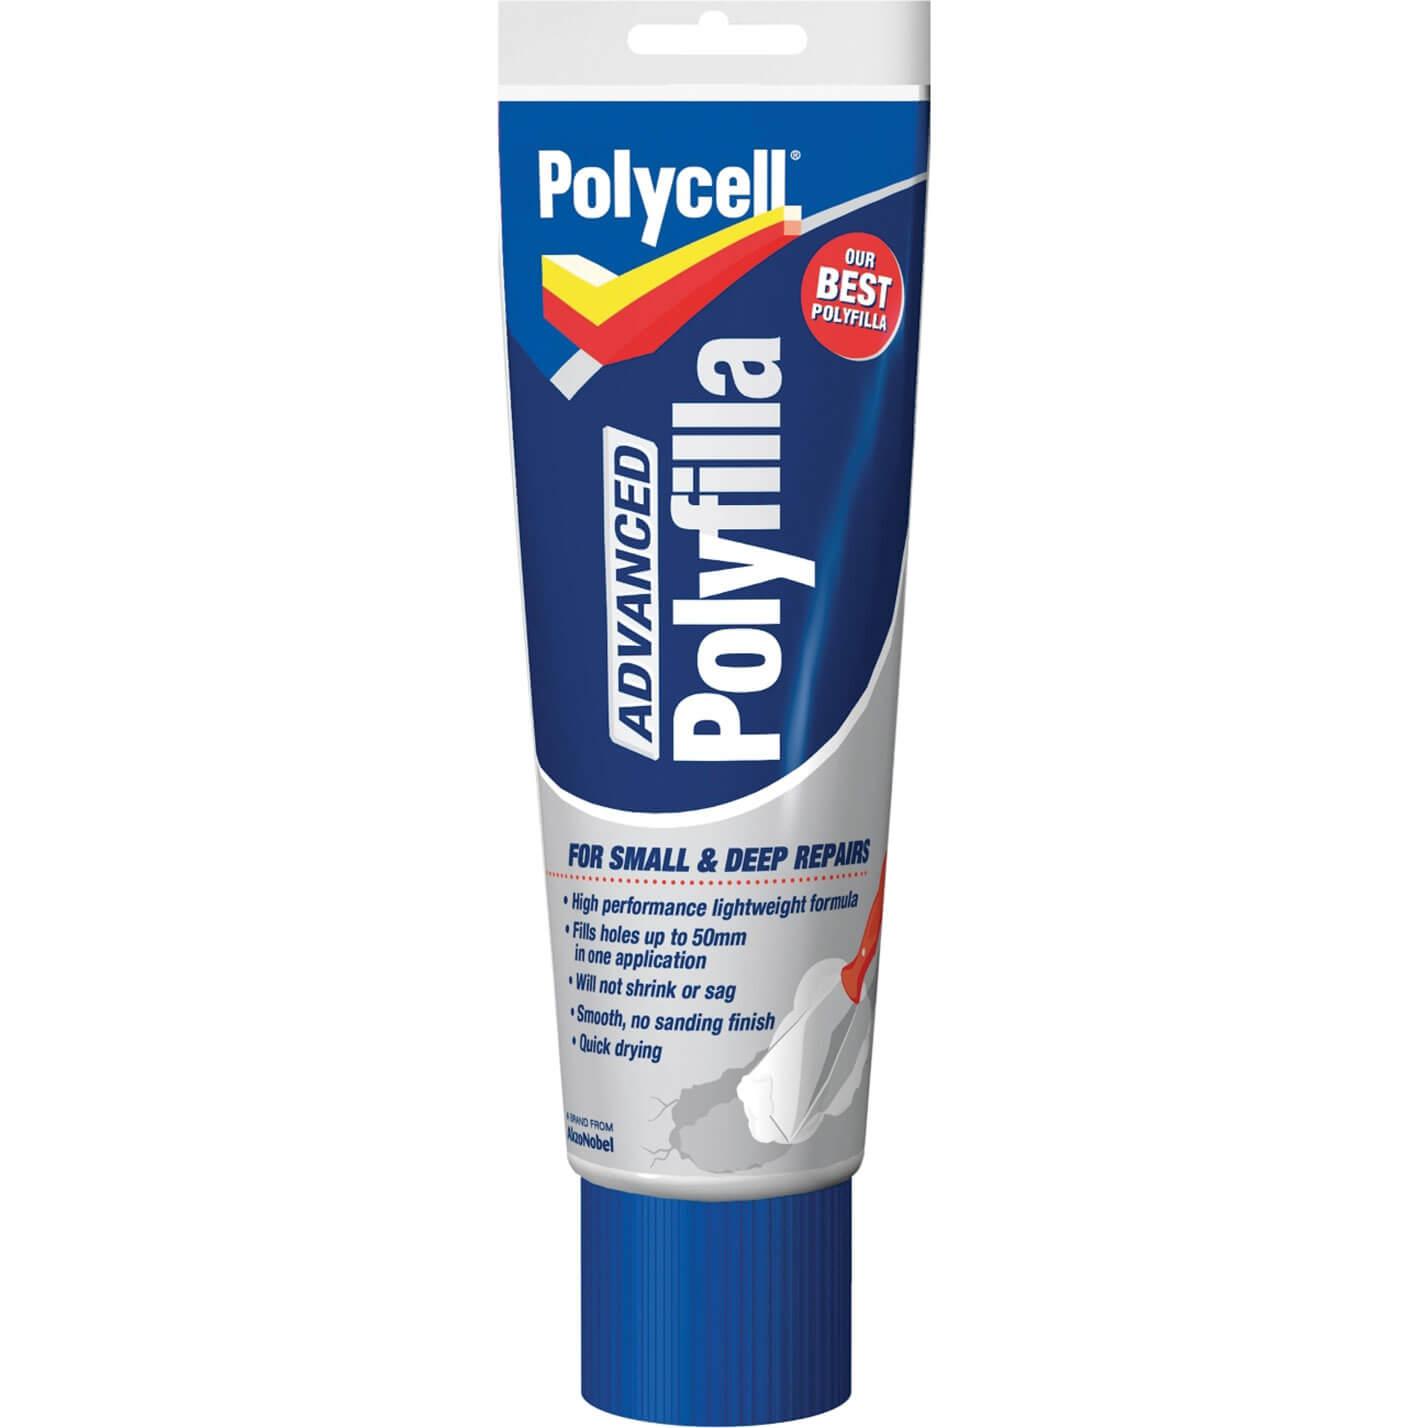 Image of Polycell Advanced Polyfilla 200ml